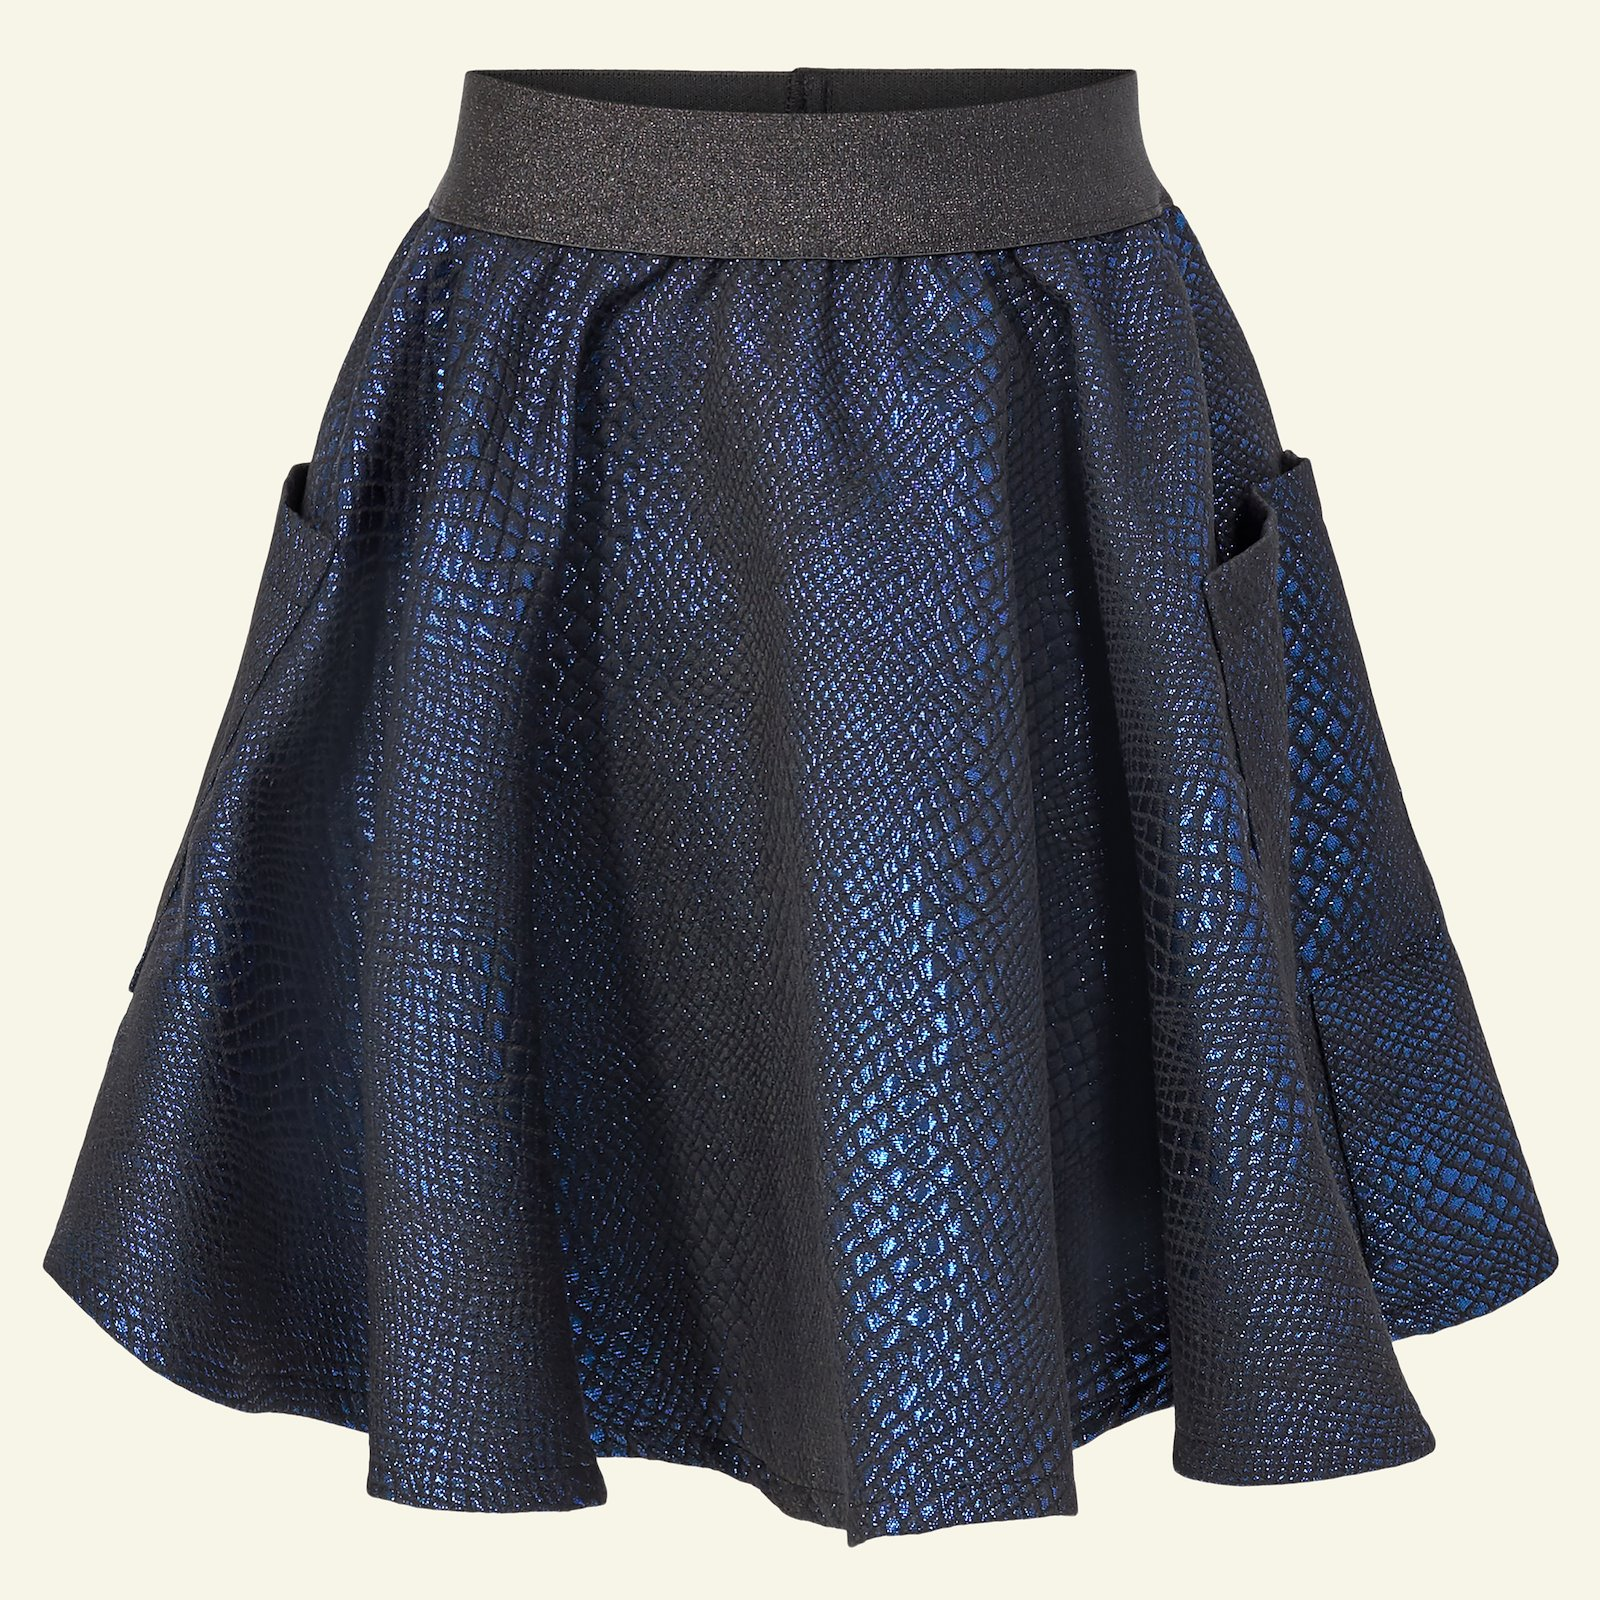 Tulle skirt, 110/5y p61018_400307_sskit